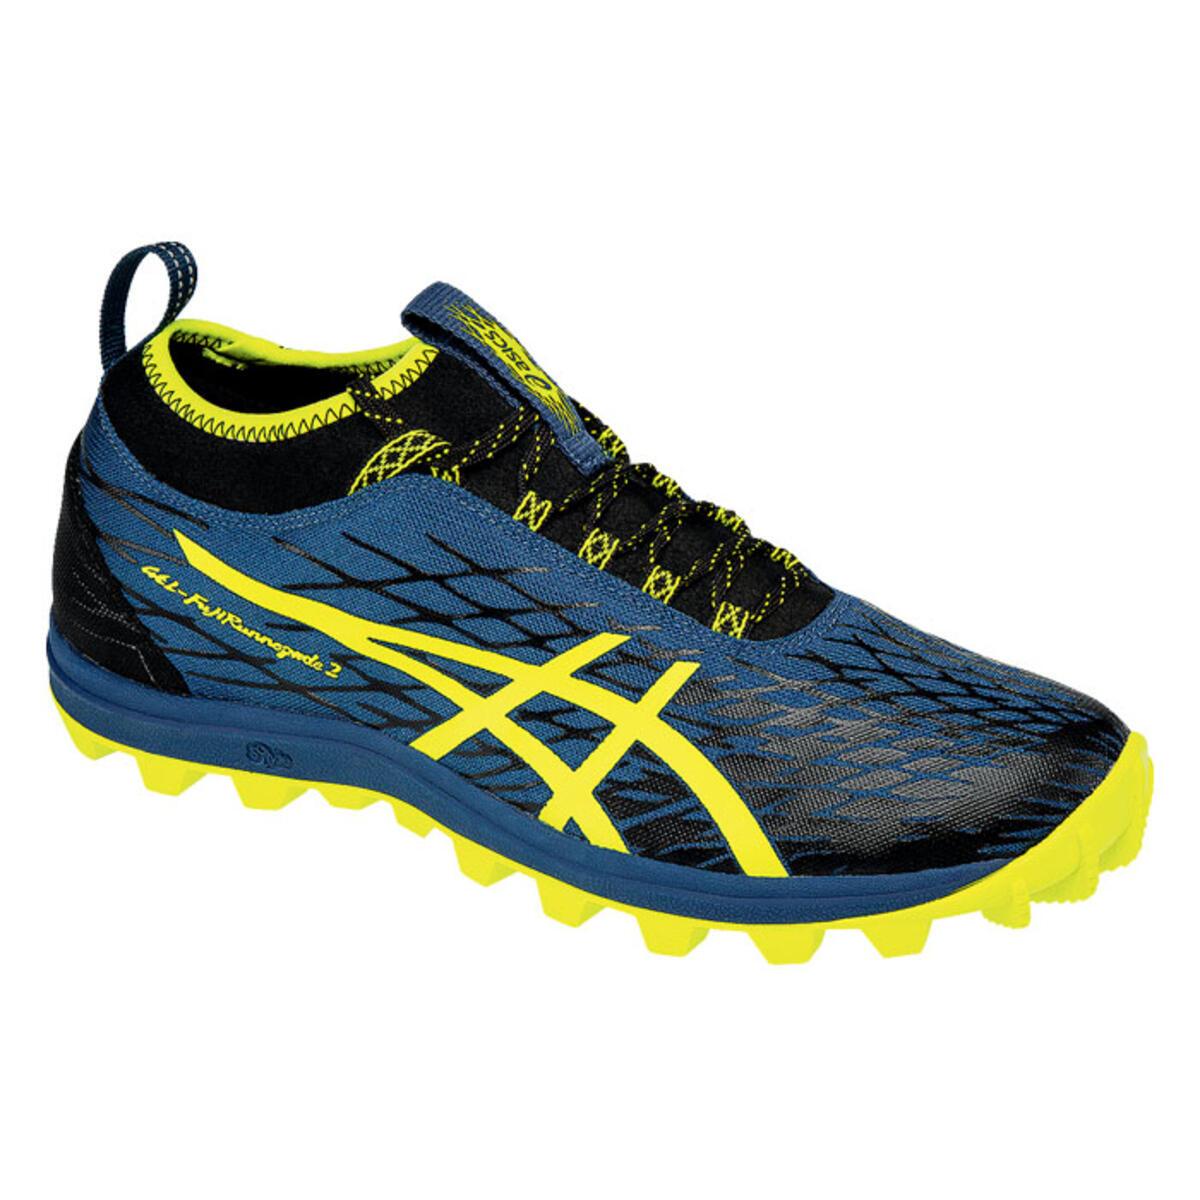 Asics Men's Gel Fujirunnegade 2 Running Shoes